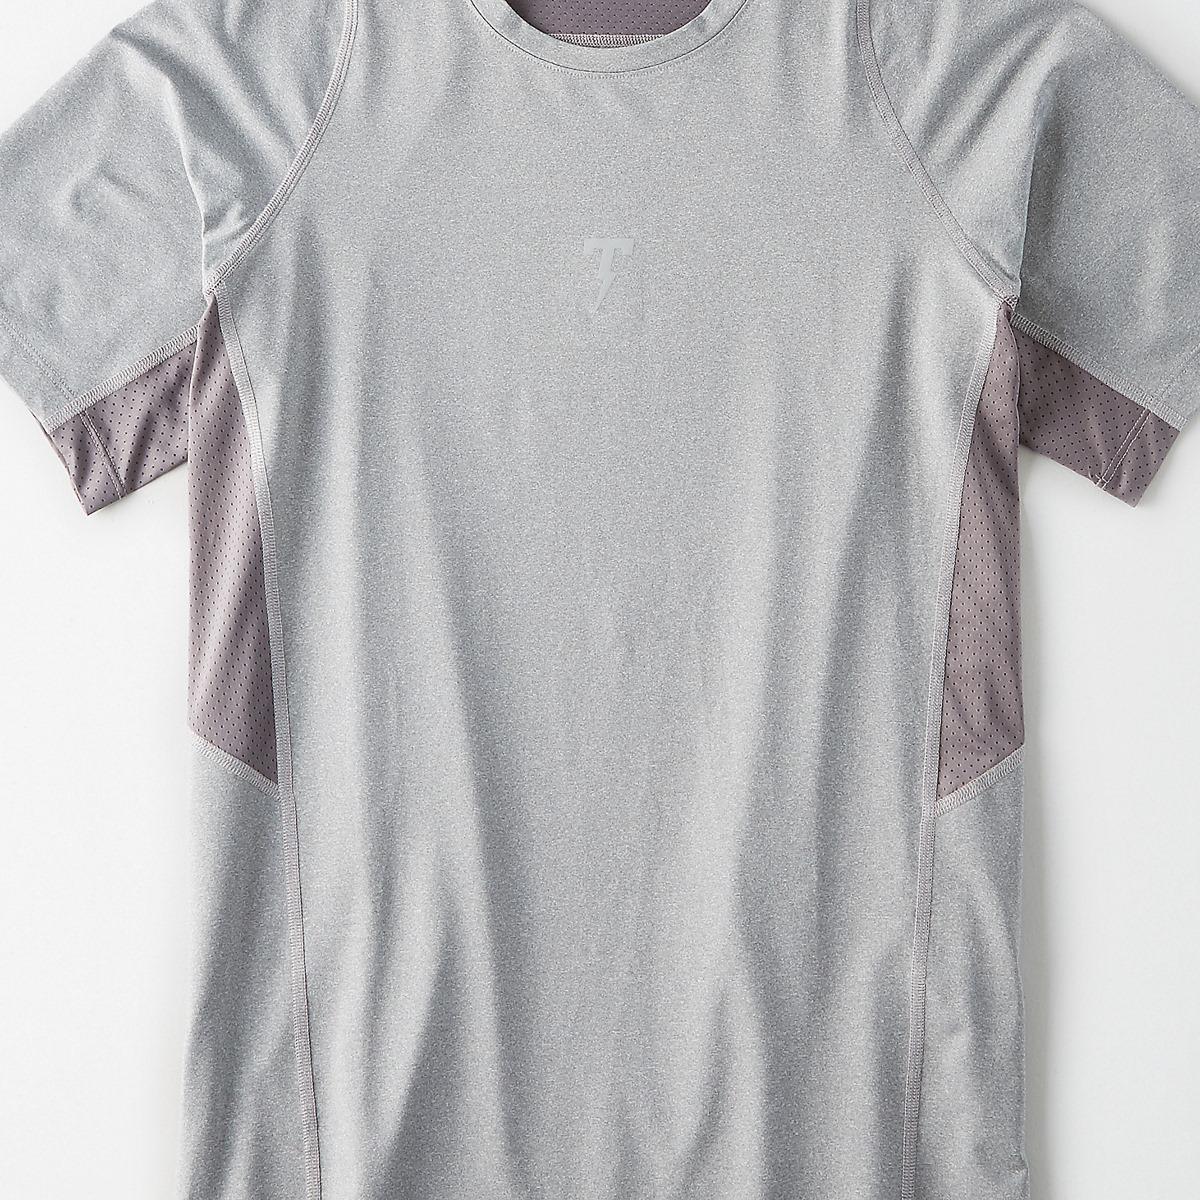 TACKMA Performance T-Shirt